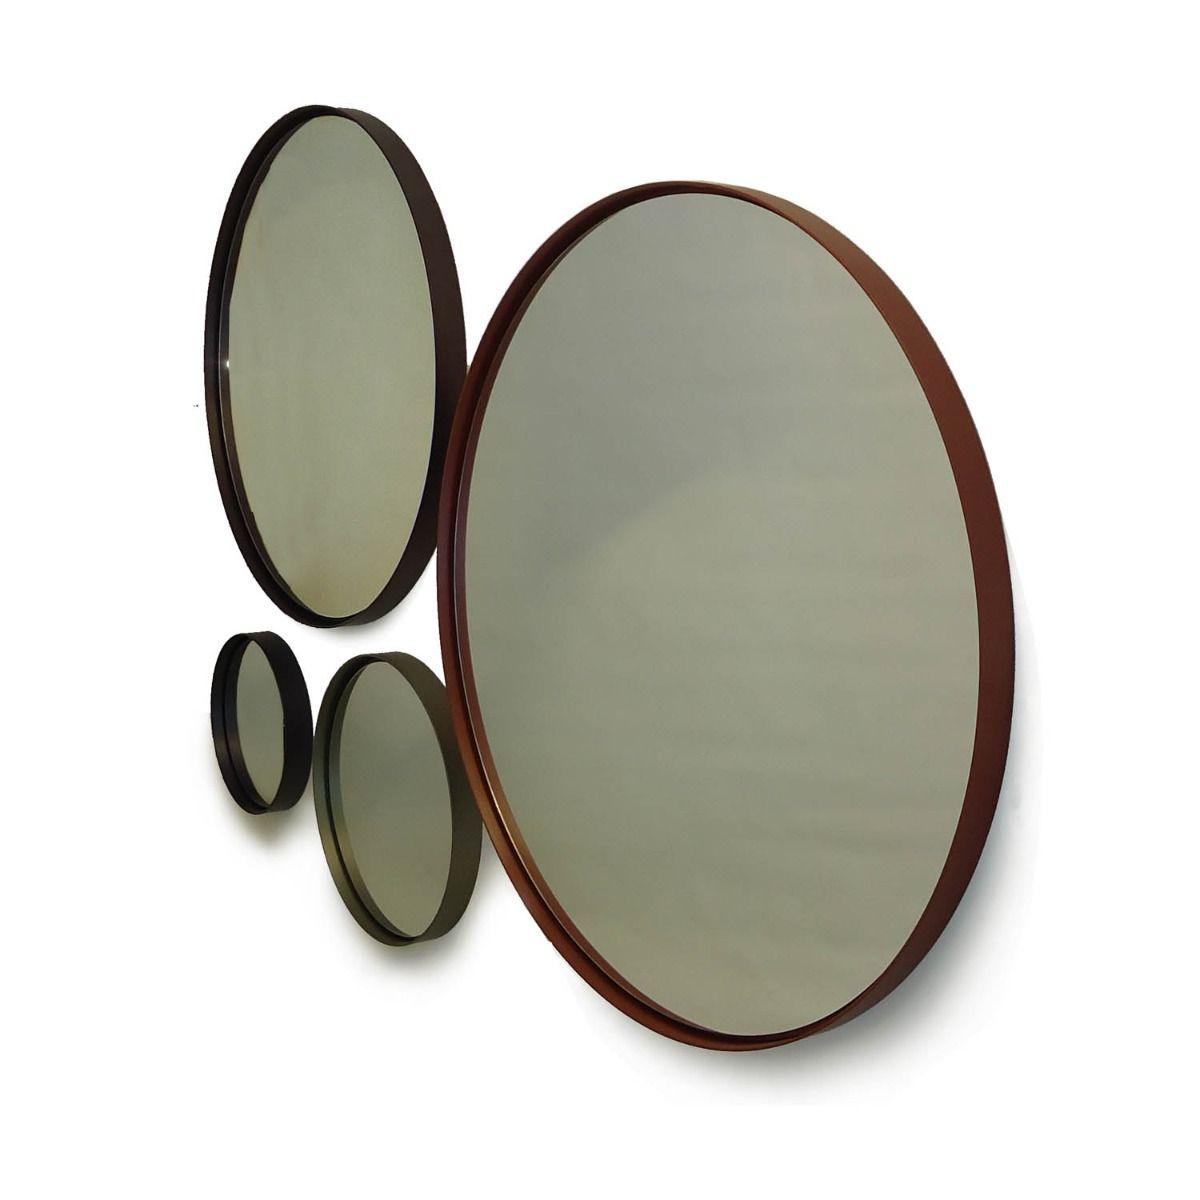 Espelho Fit Redondo • estudiobola